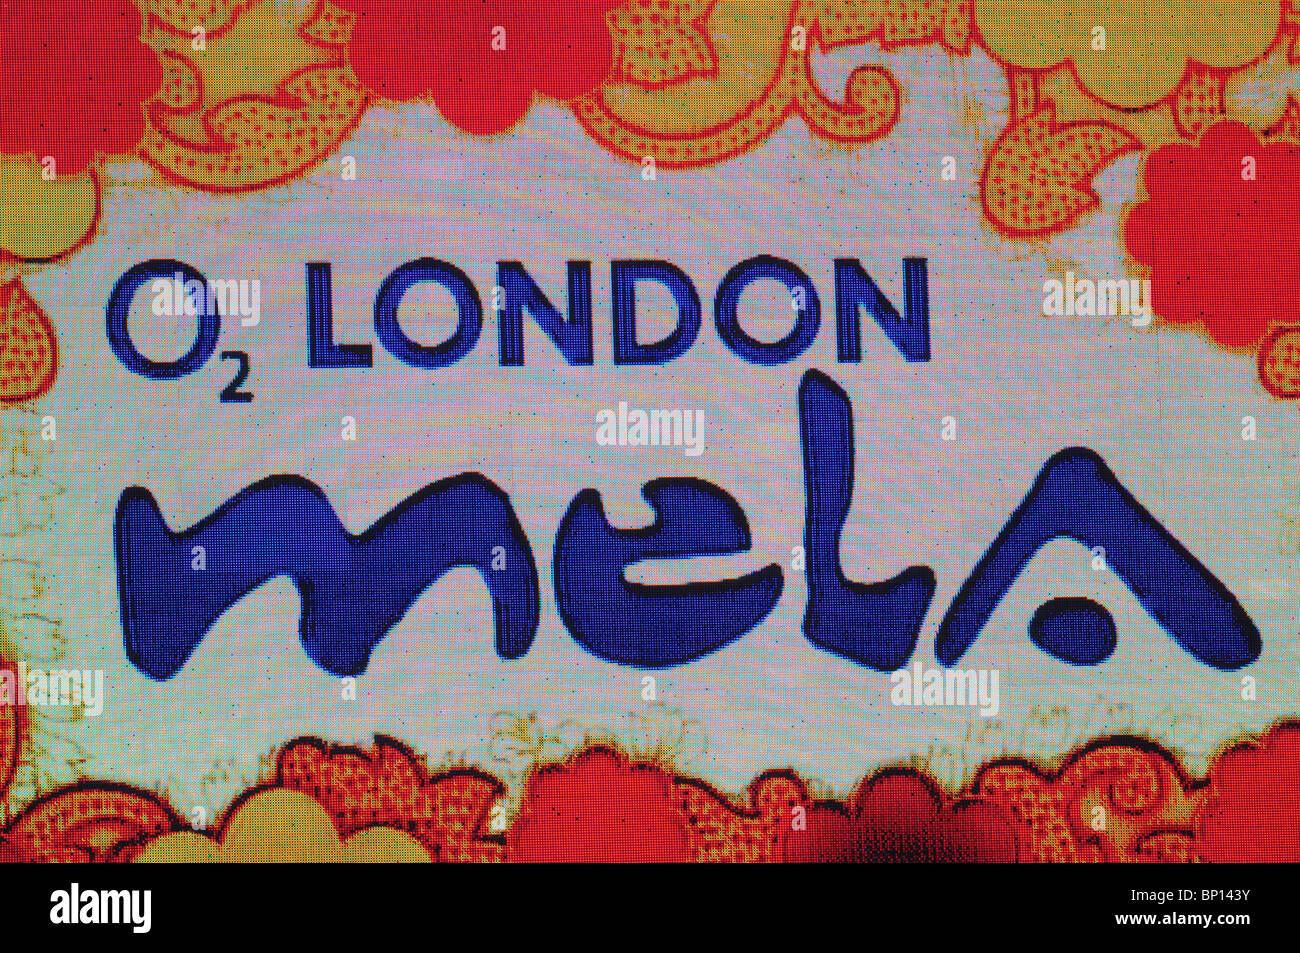 O2 London Mela big screen billboard advertisement, Gunnersbury Park, London, England, UK - Stock Image